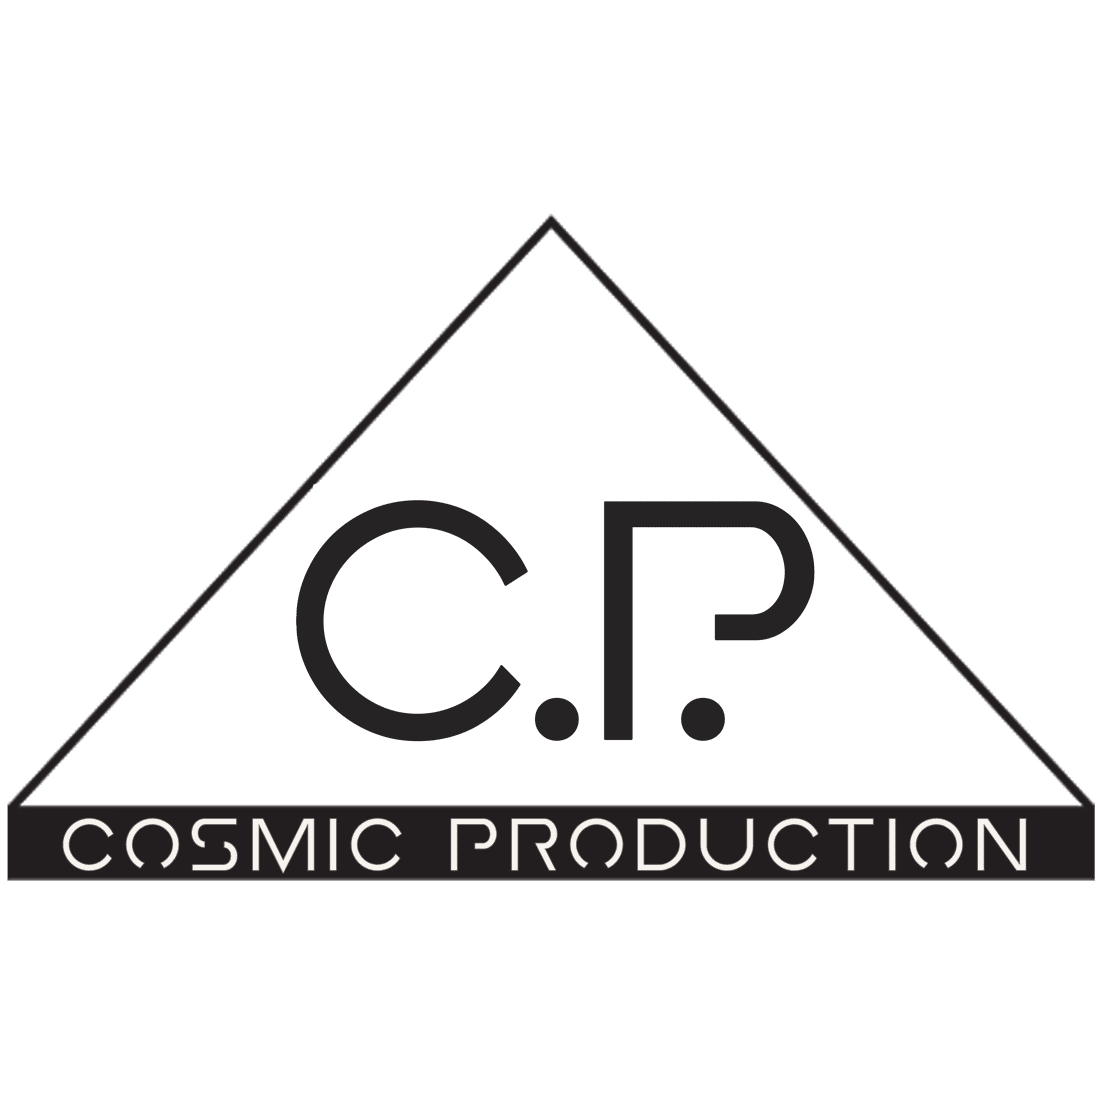 Cosmic Production